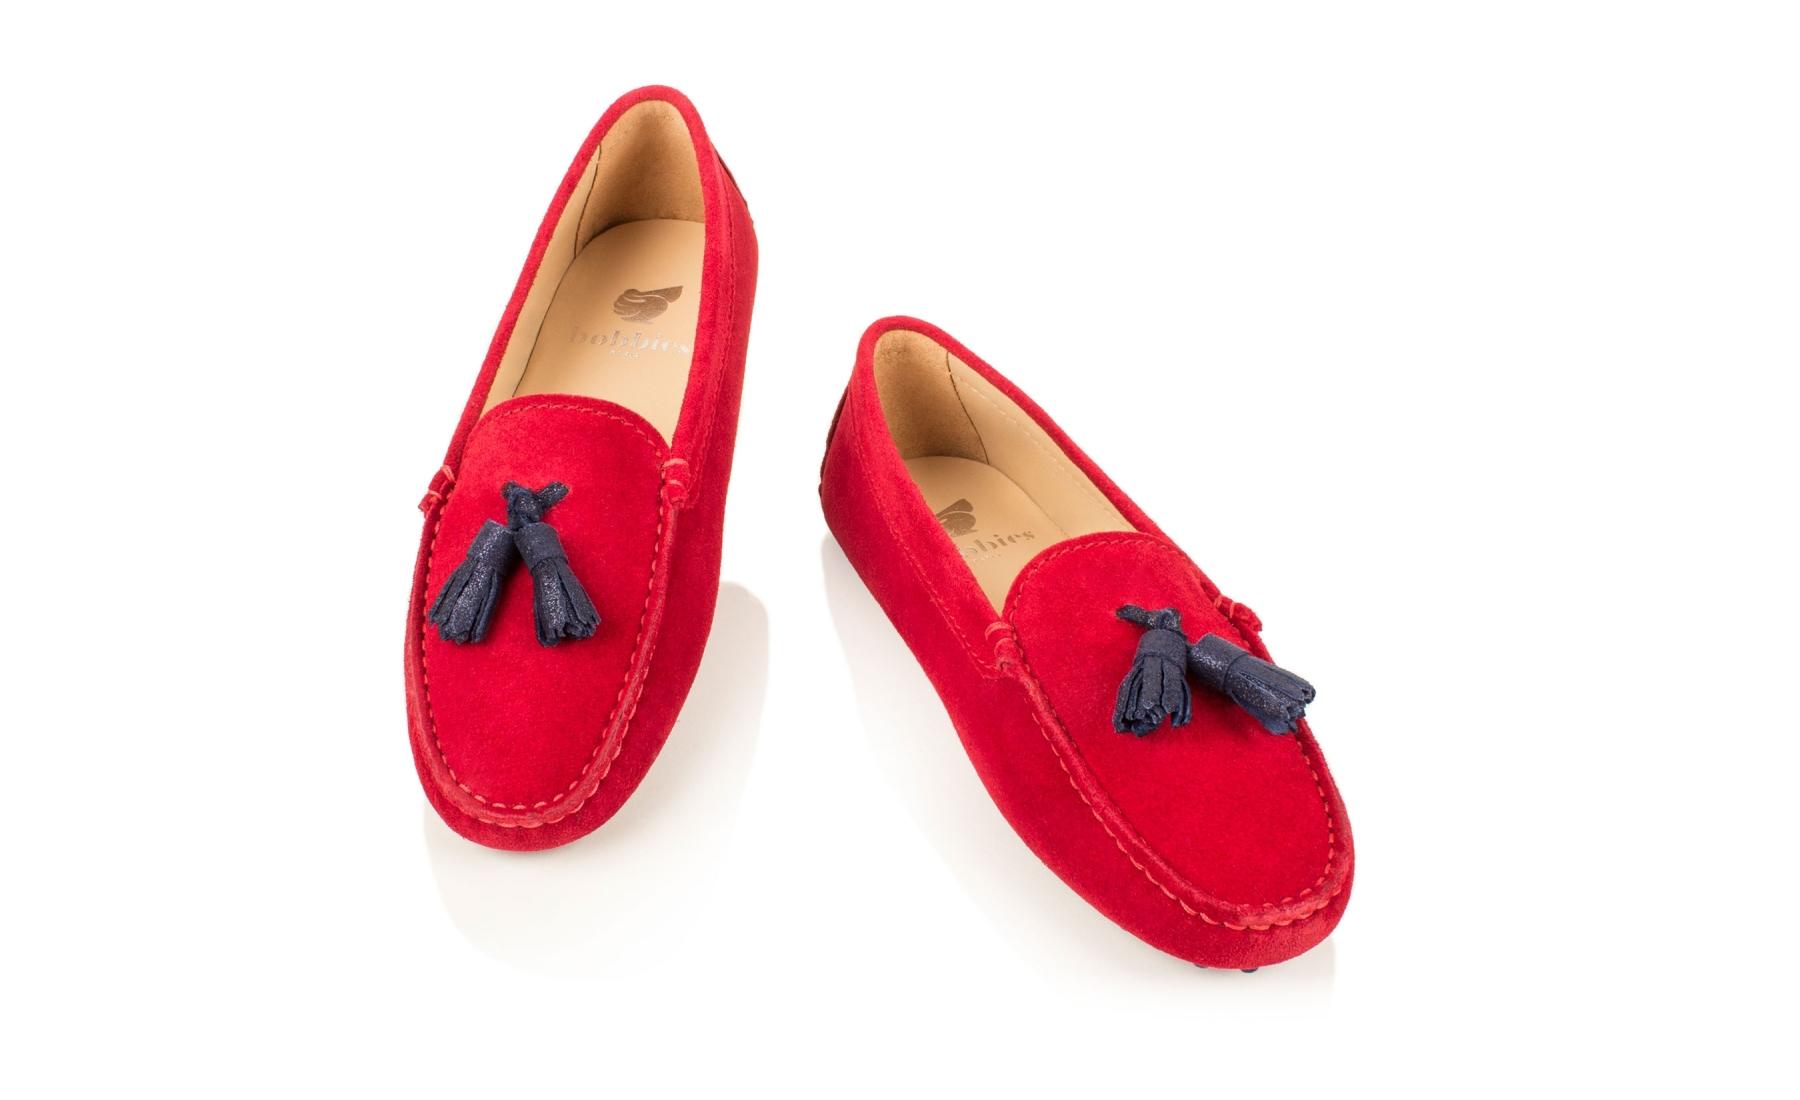 mocassin femme j 39 aime les chaussures de ma femme. Black Bedroom Furniture Sets. Home Design Ideas